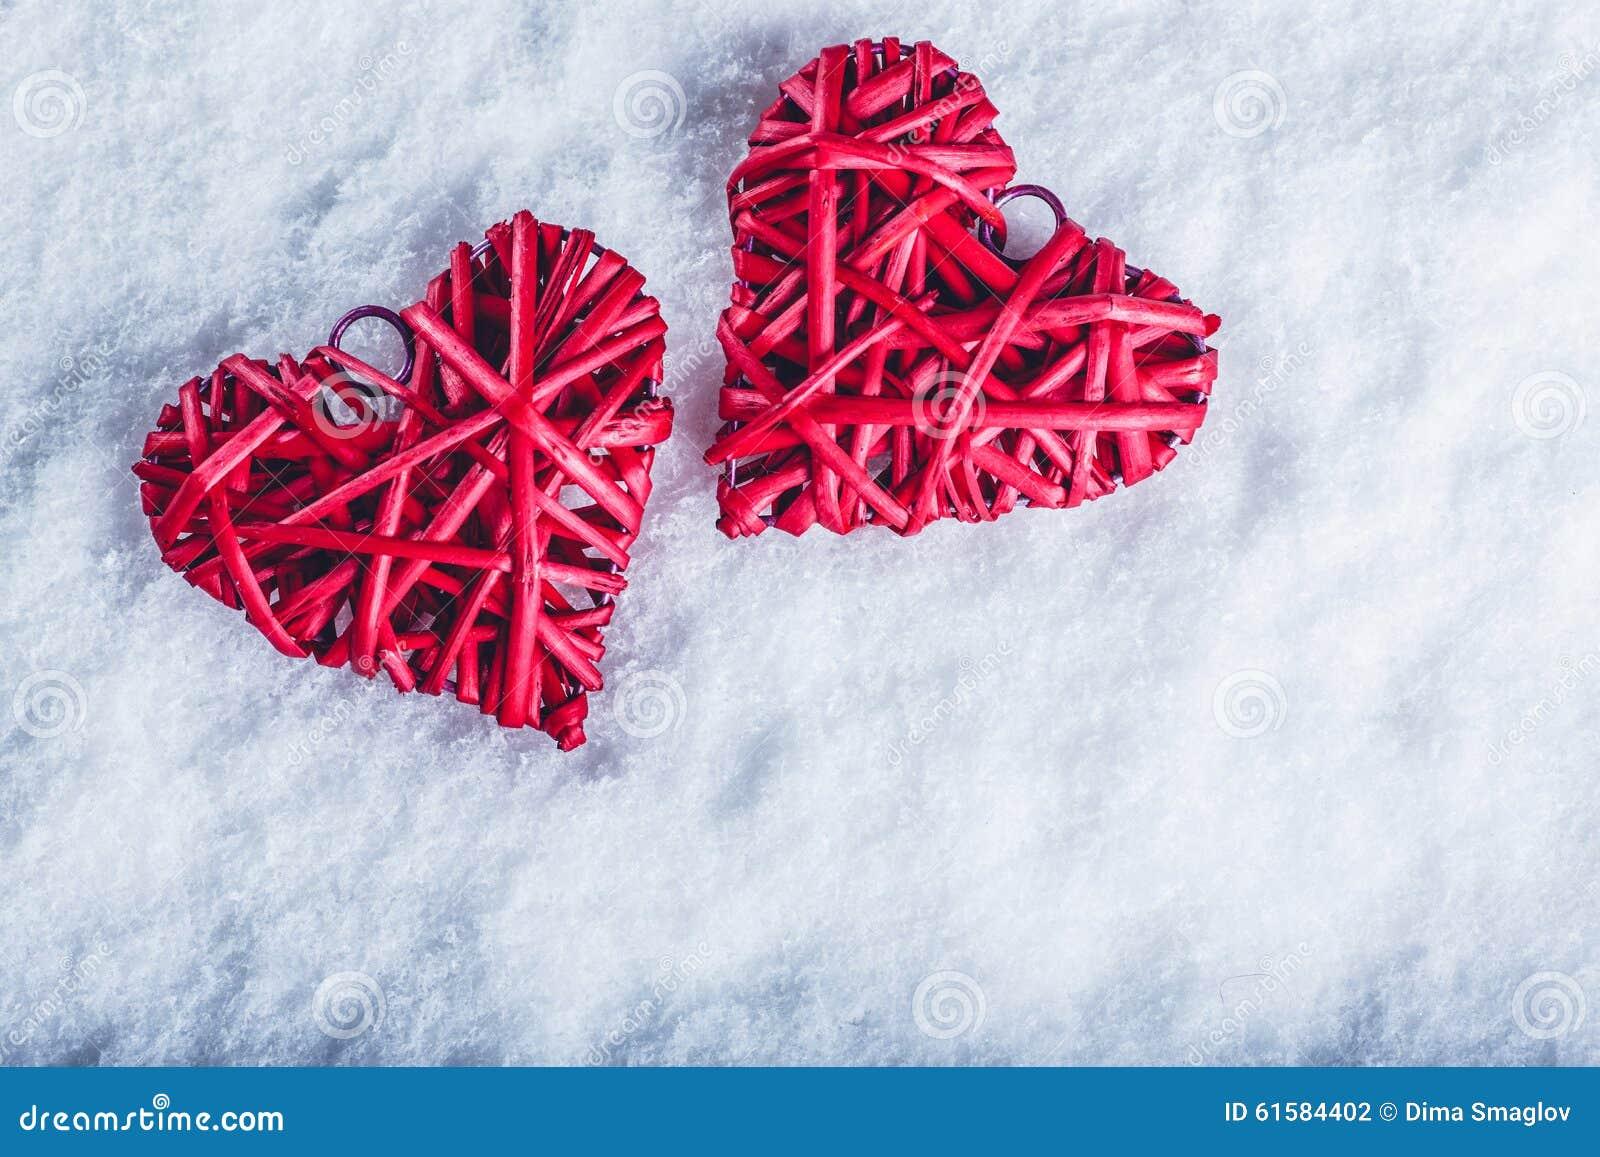 354 best ☆ Un bleu d'hiver......... images on Pinterest ...   Hearts In Nature Winter